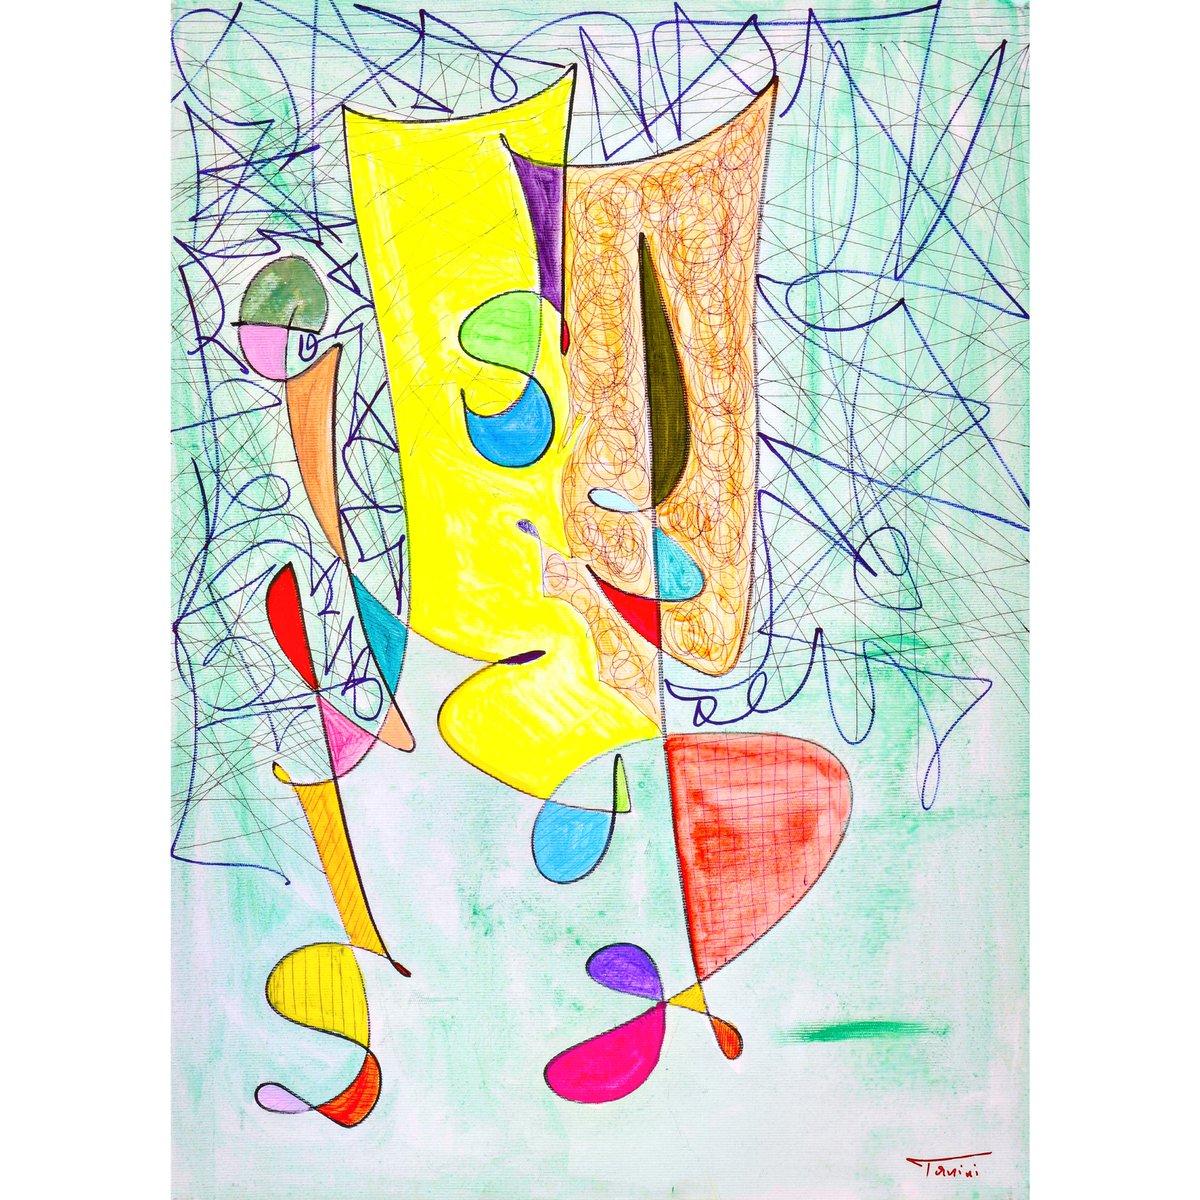 #eljantanini🏃#privatecollection 50x70 🎨☀🐦 #swallows and theatre #Tirana #emergingartist #tanini 2019 #art #acrylicpainting  #GeometricAbstraction #FineArt #pitturacontemporanea #contemporaryart #contemporarypainting #abstractart #modernartist #dailyart #artist #artoftheday